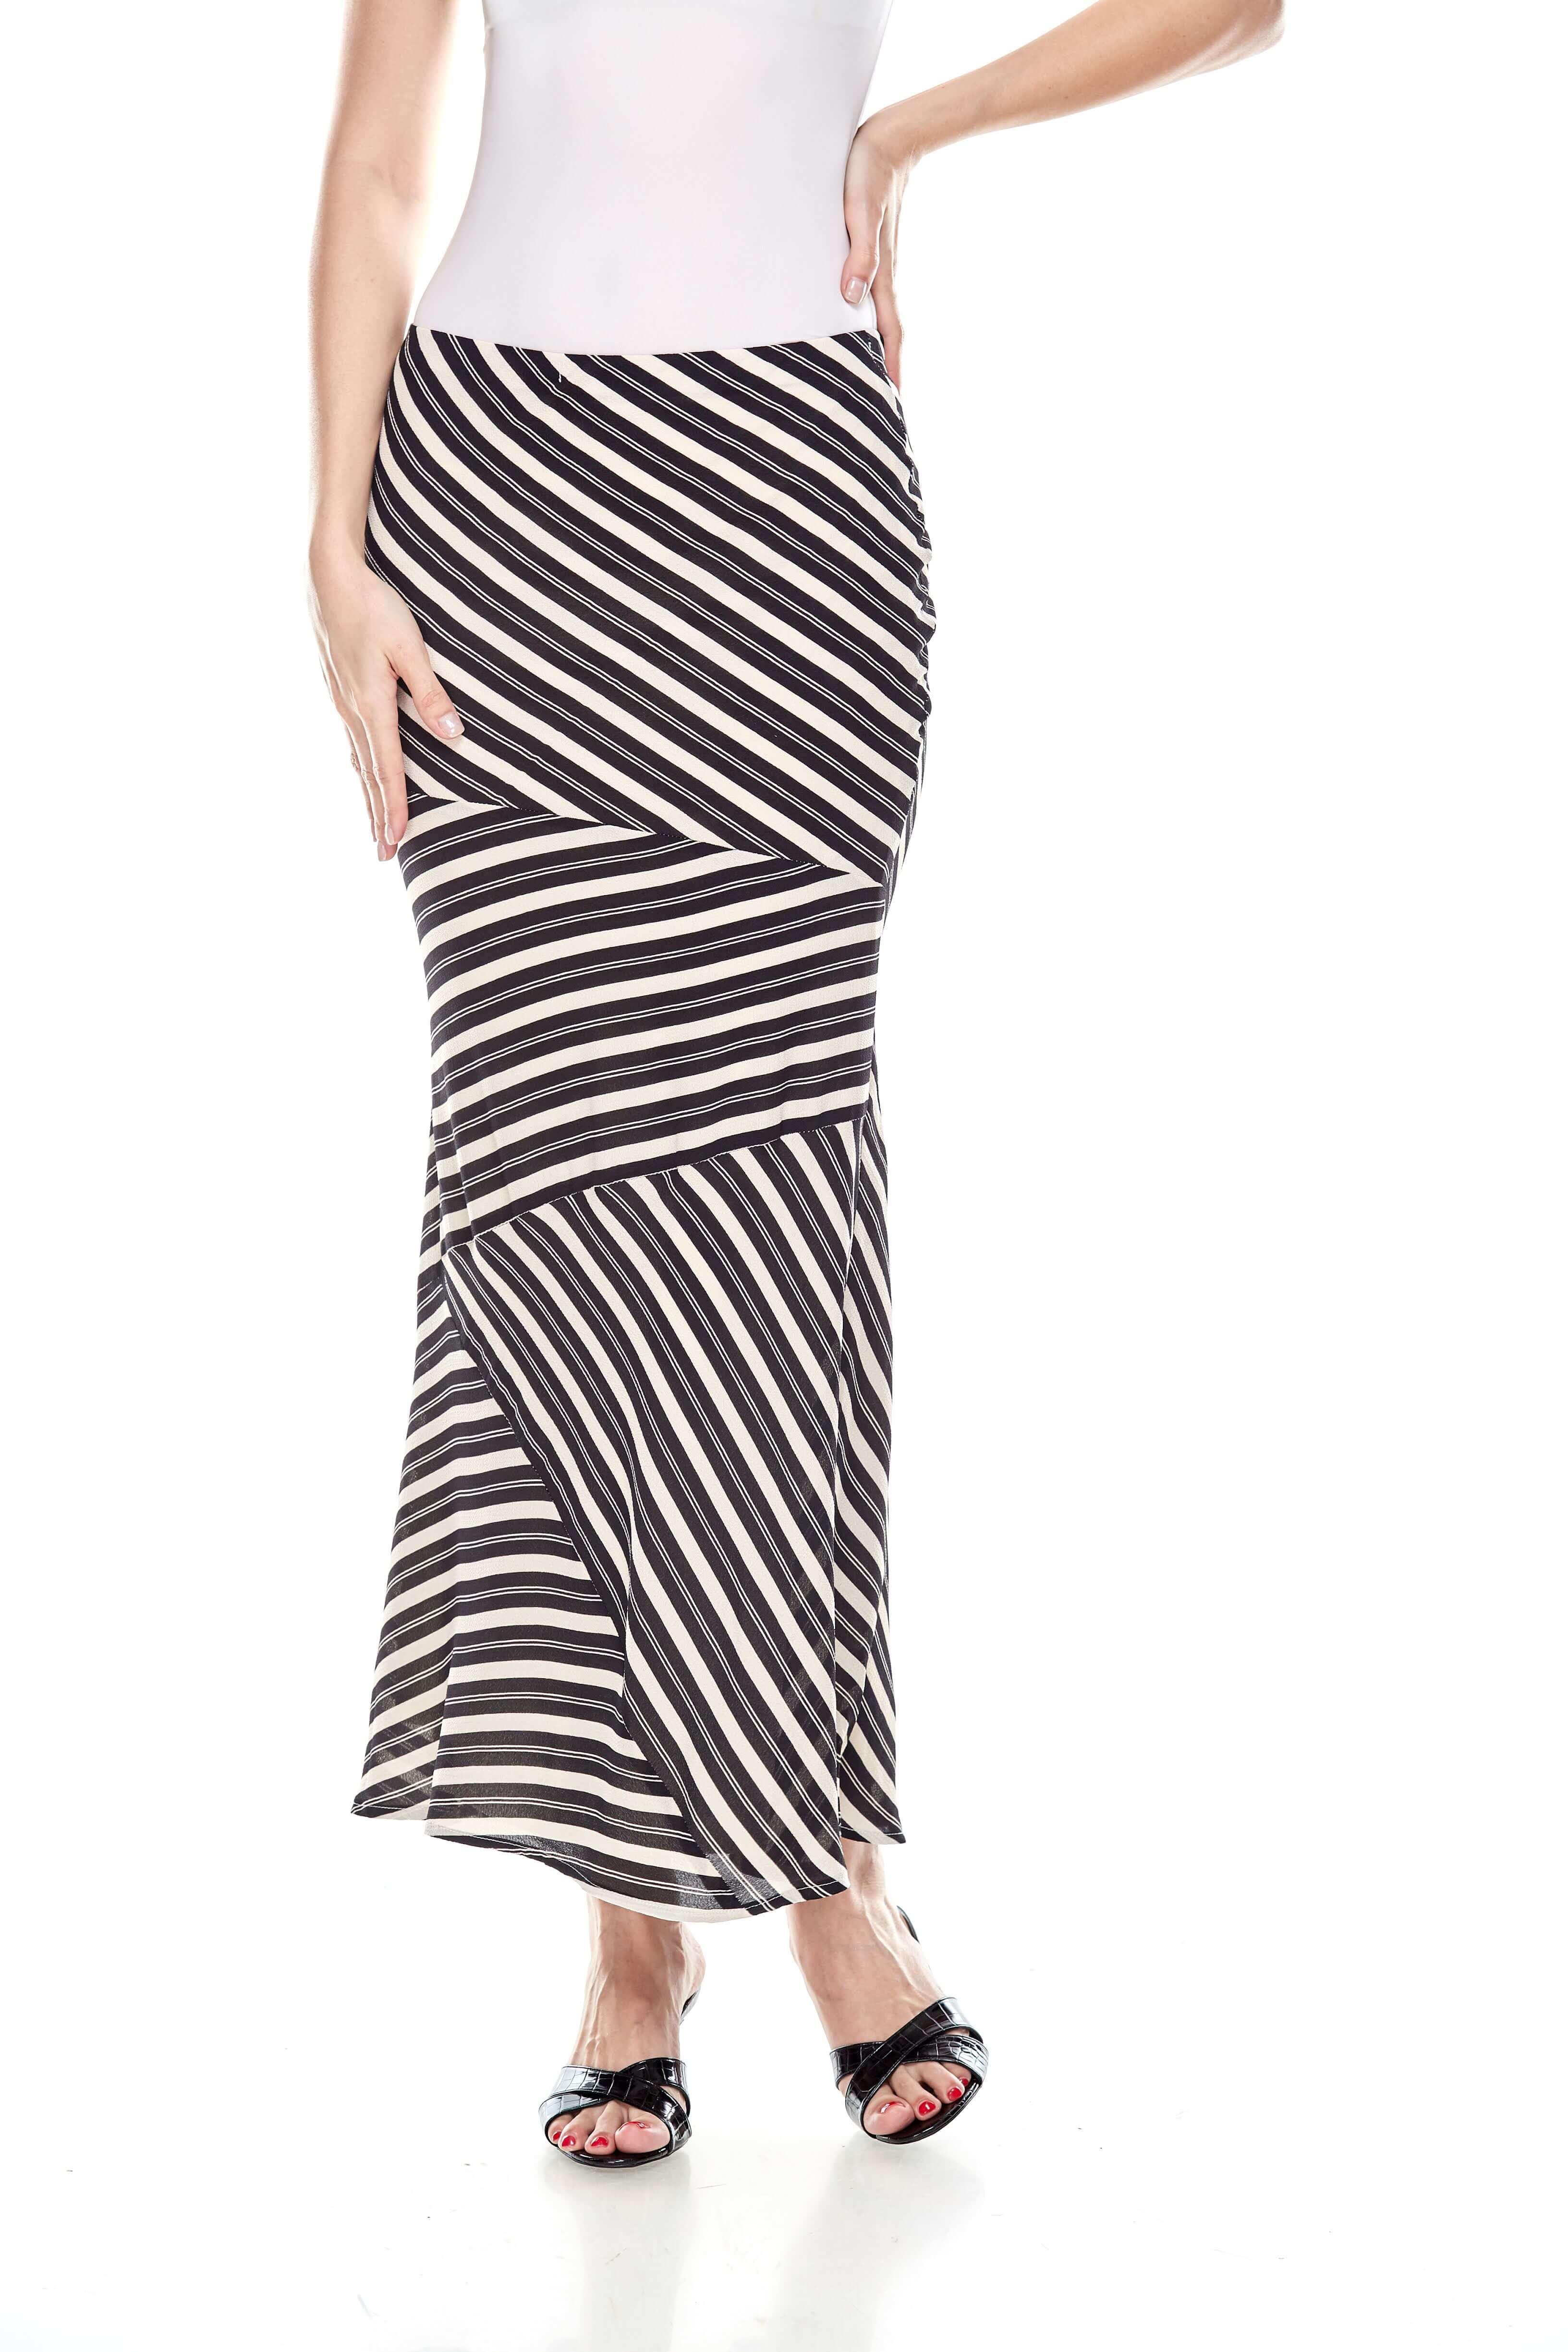 Black Striped Mermaid Skirt